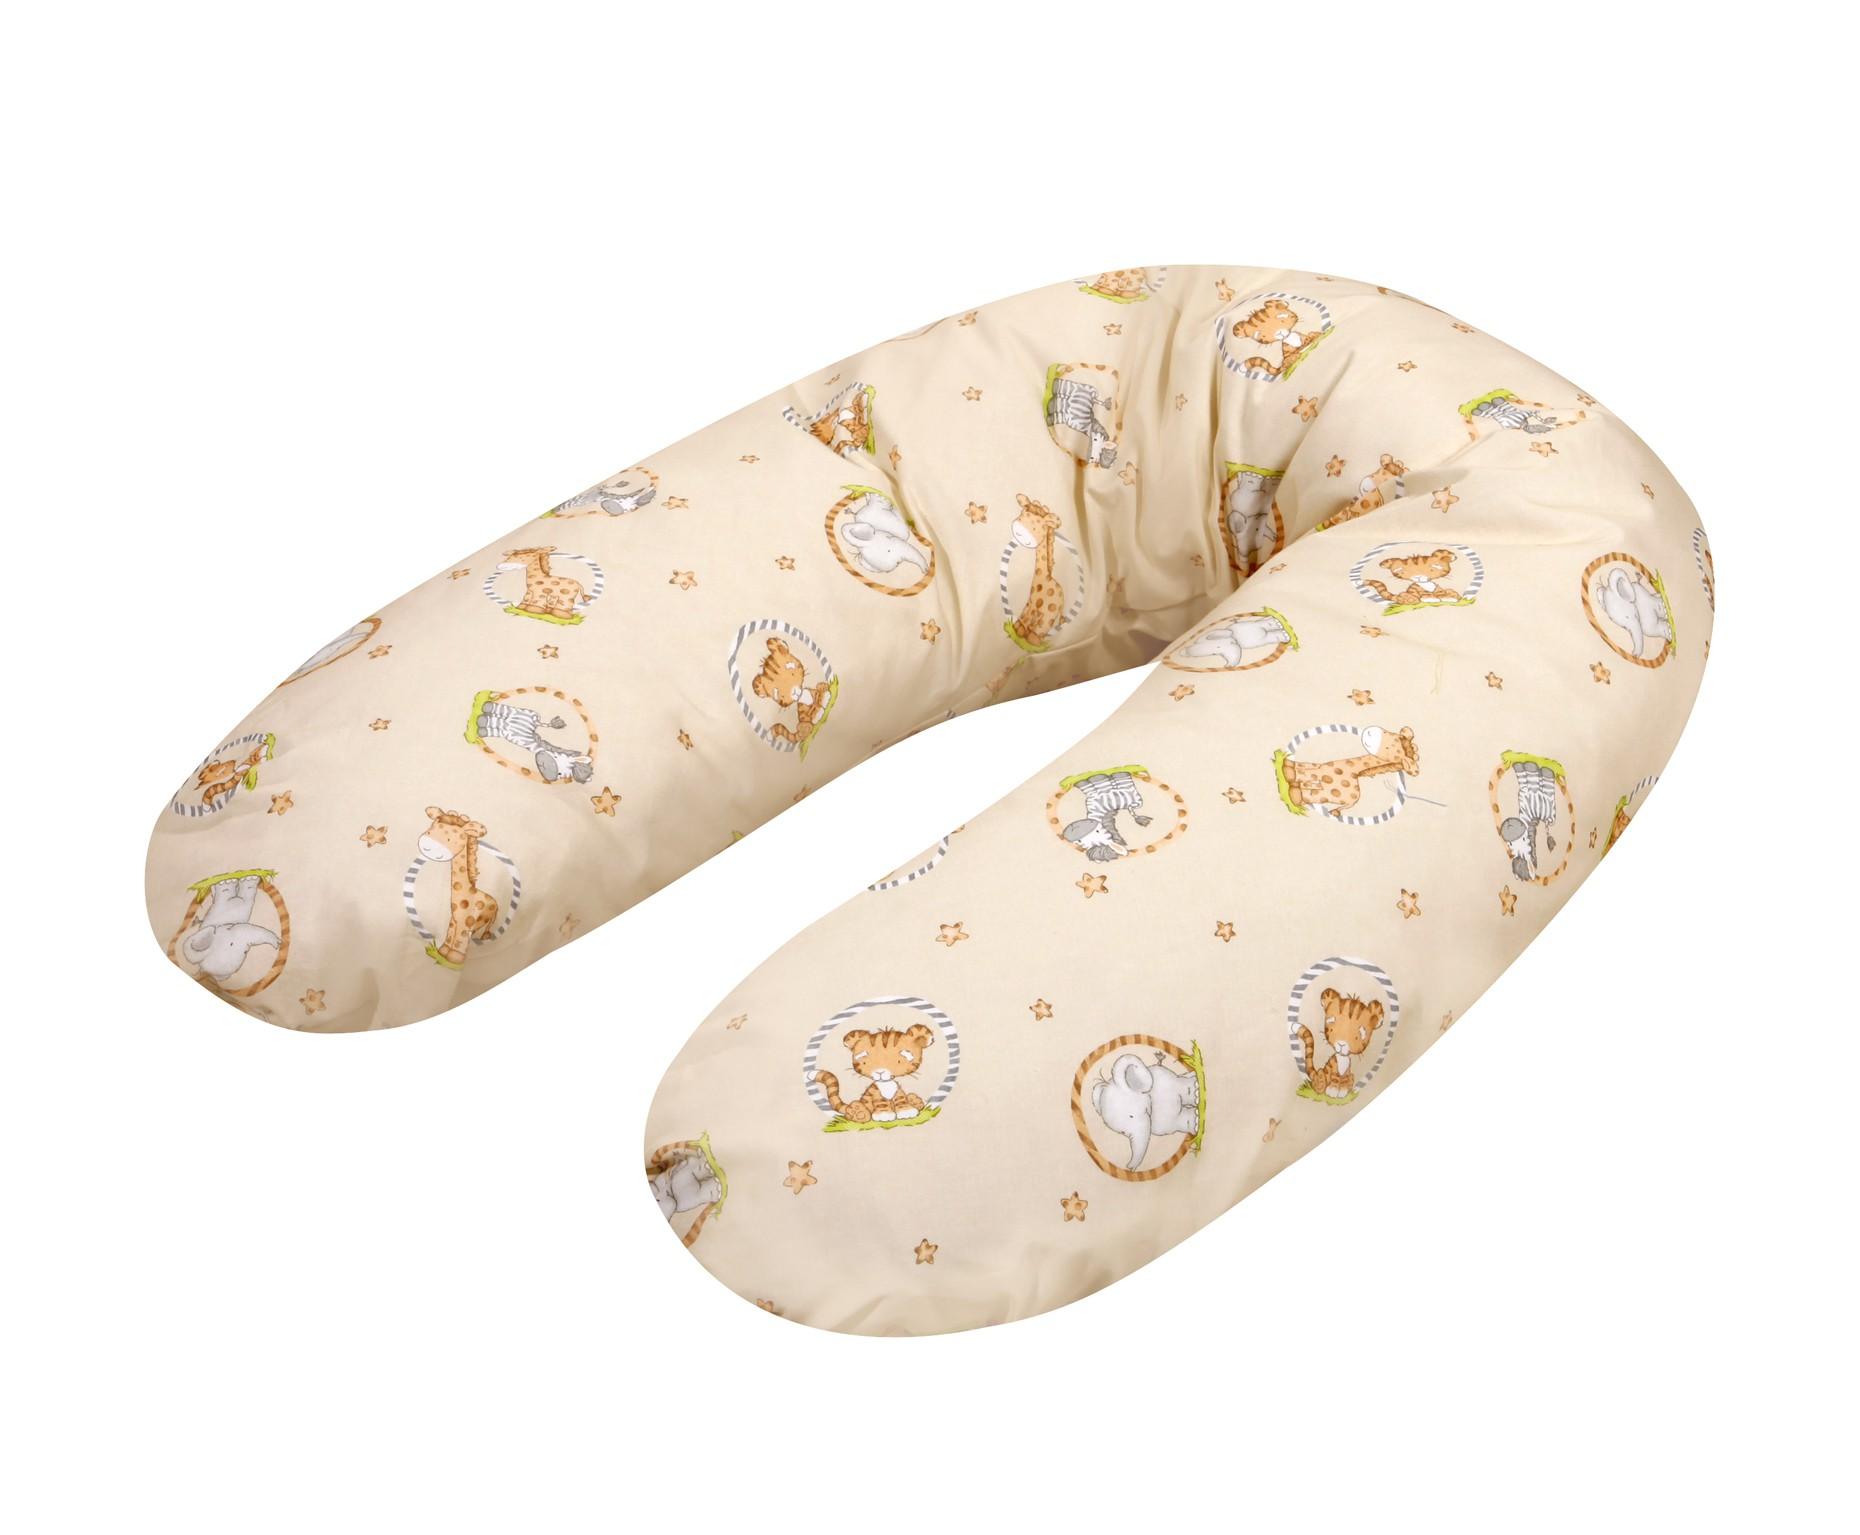 Zöllner Stillkissen Banane Perlenfüllung 30 l